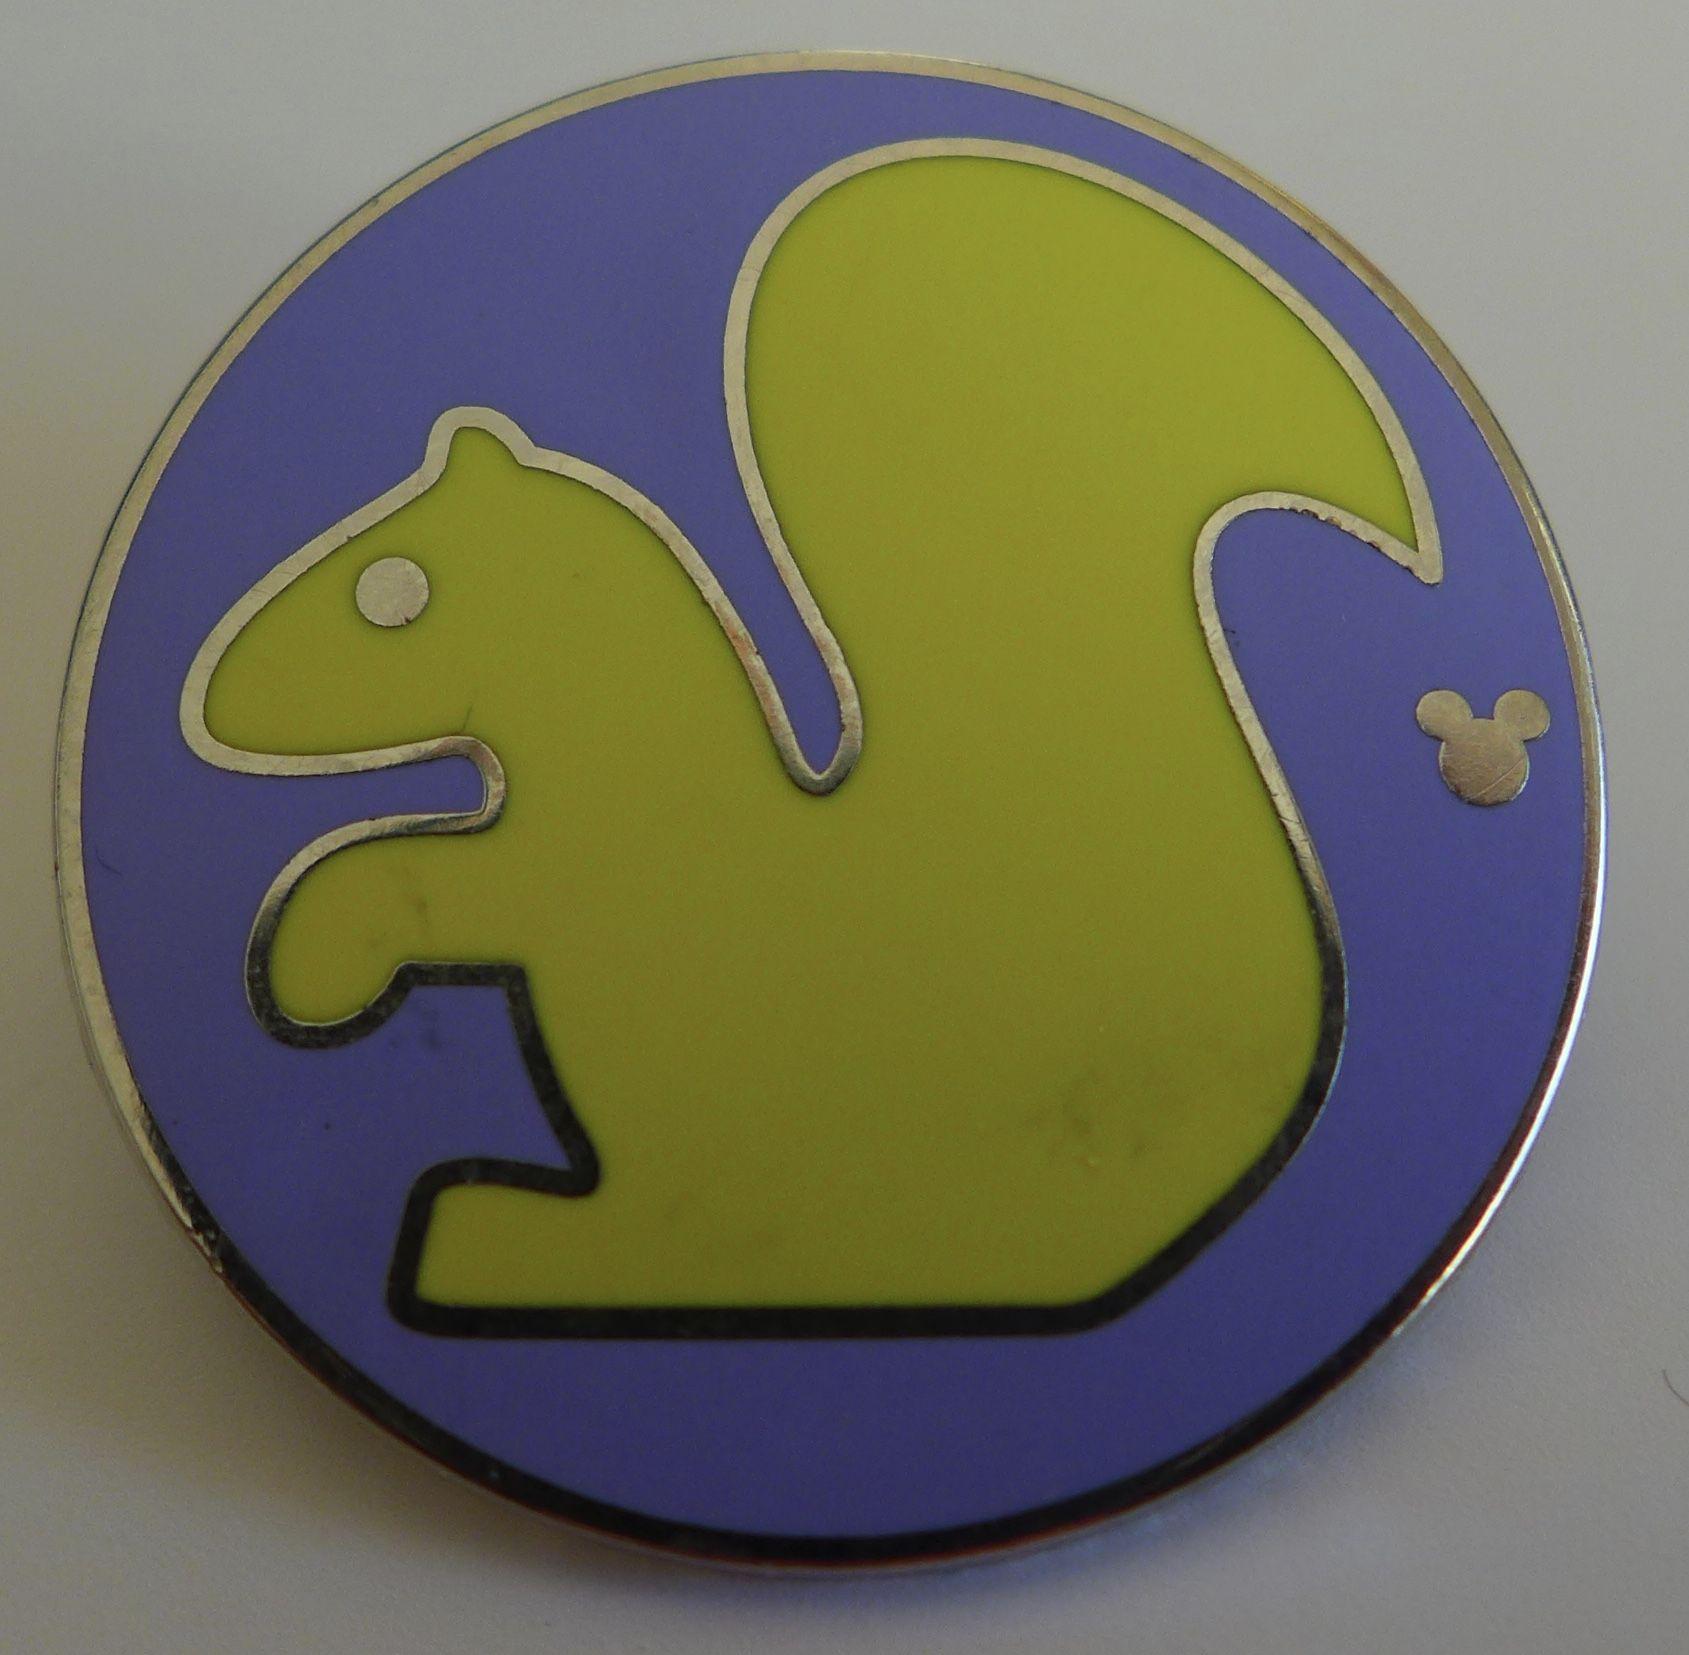 Pin by Lloyd Phillips on Disney Trading Pins   Disney ...